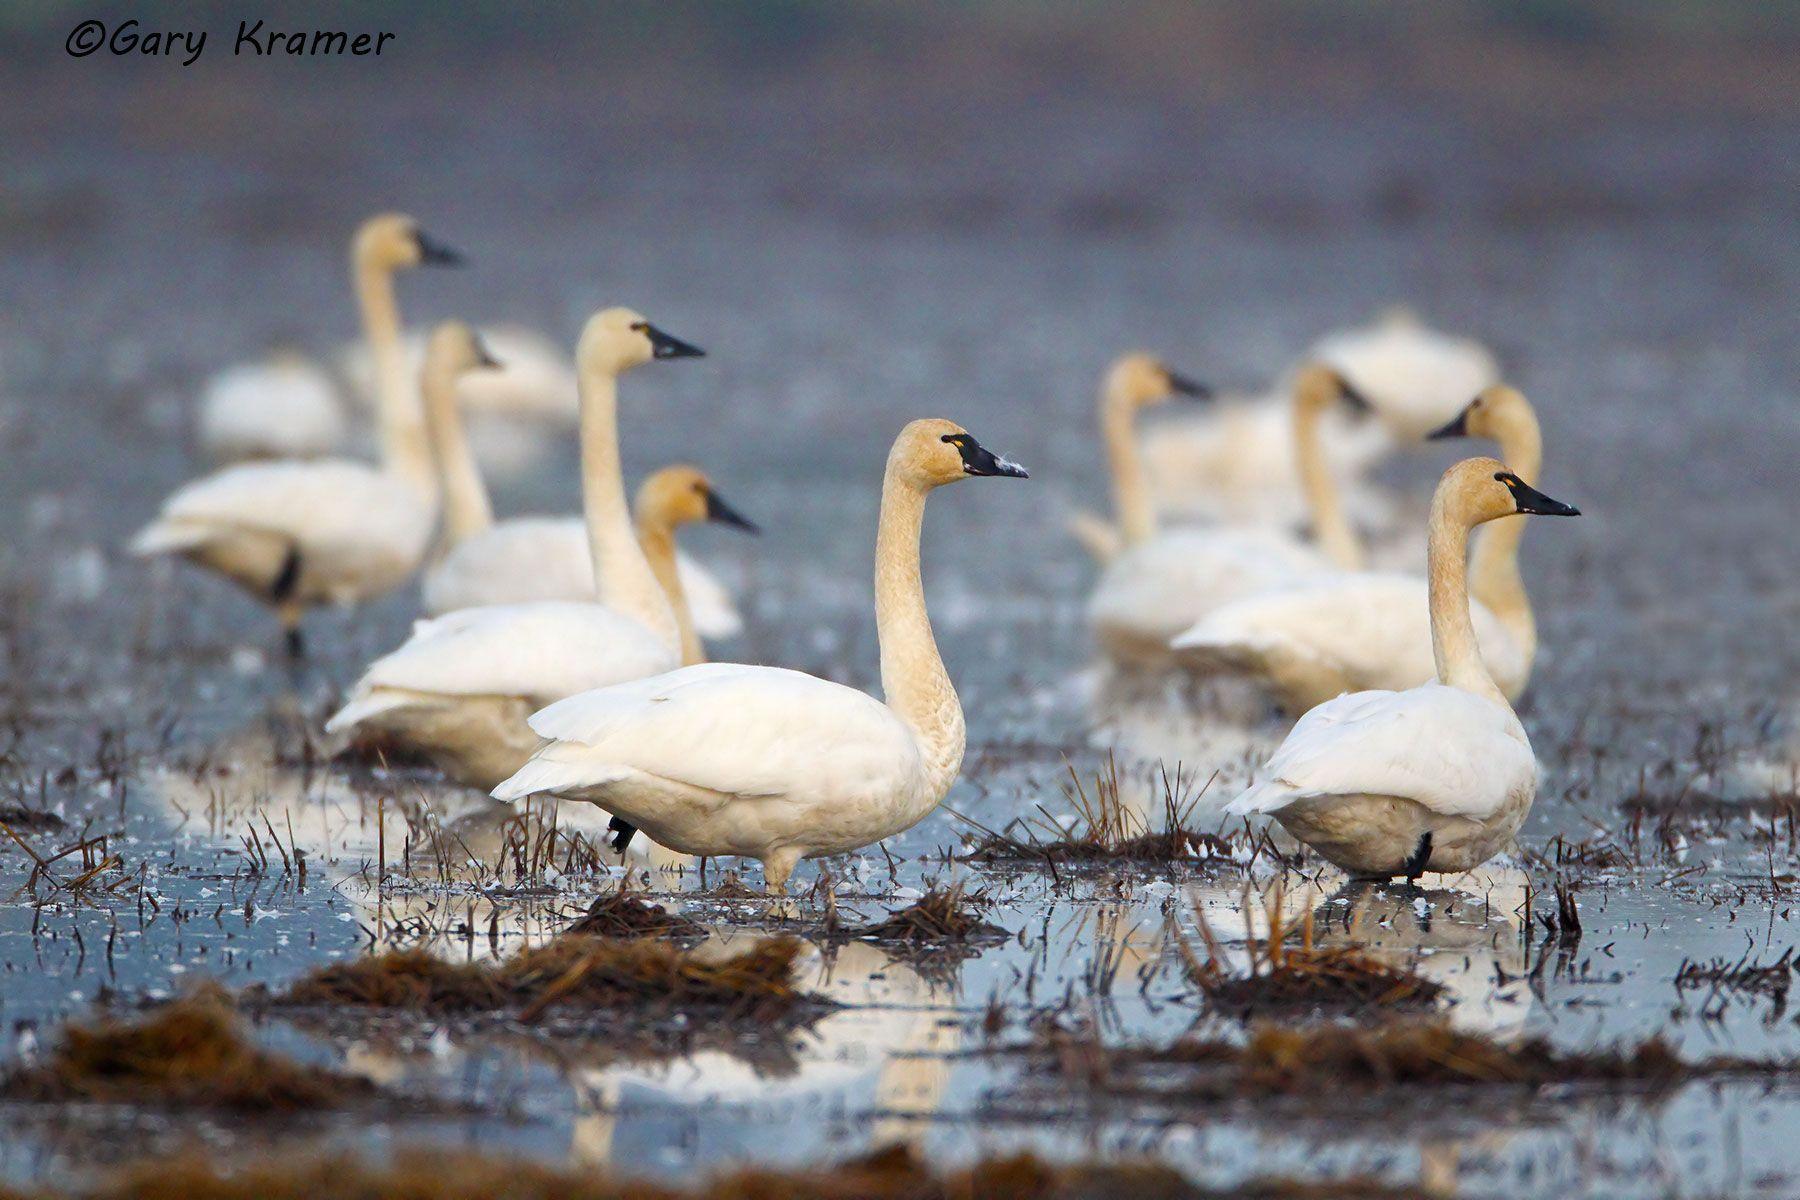 Tundra (Whistling) Swan (Cygnus columbianus) - NBWT#246d